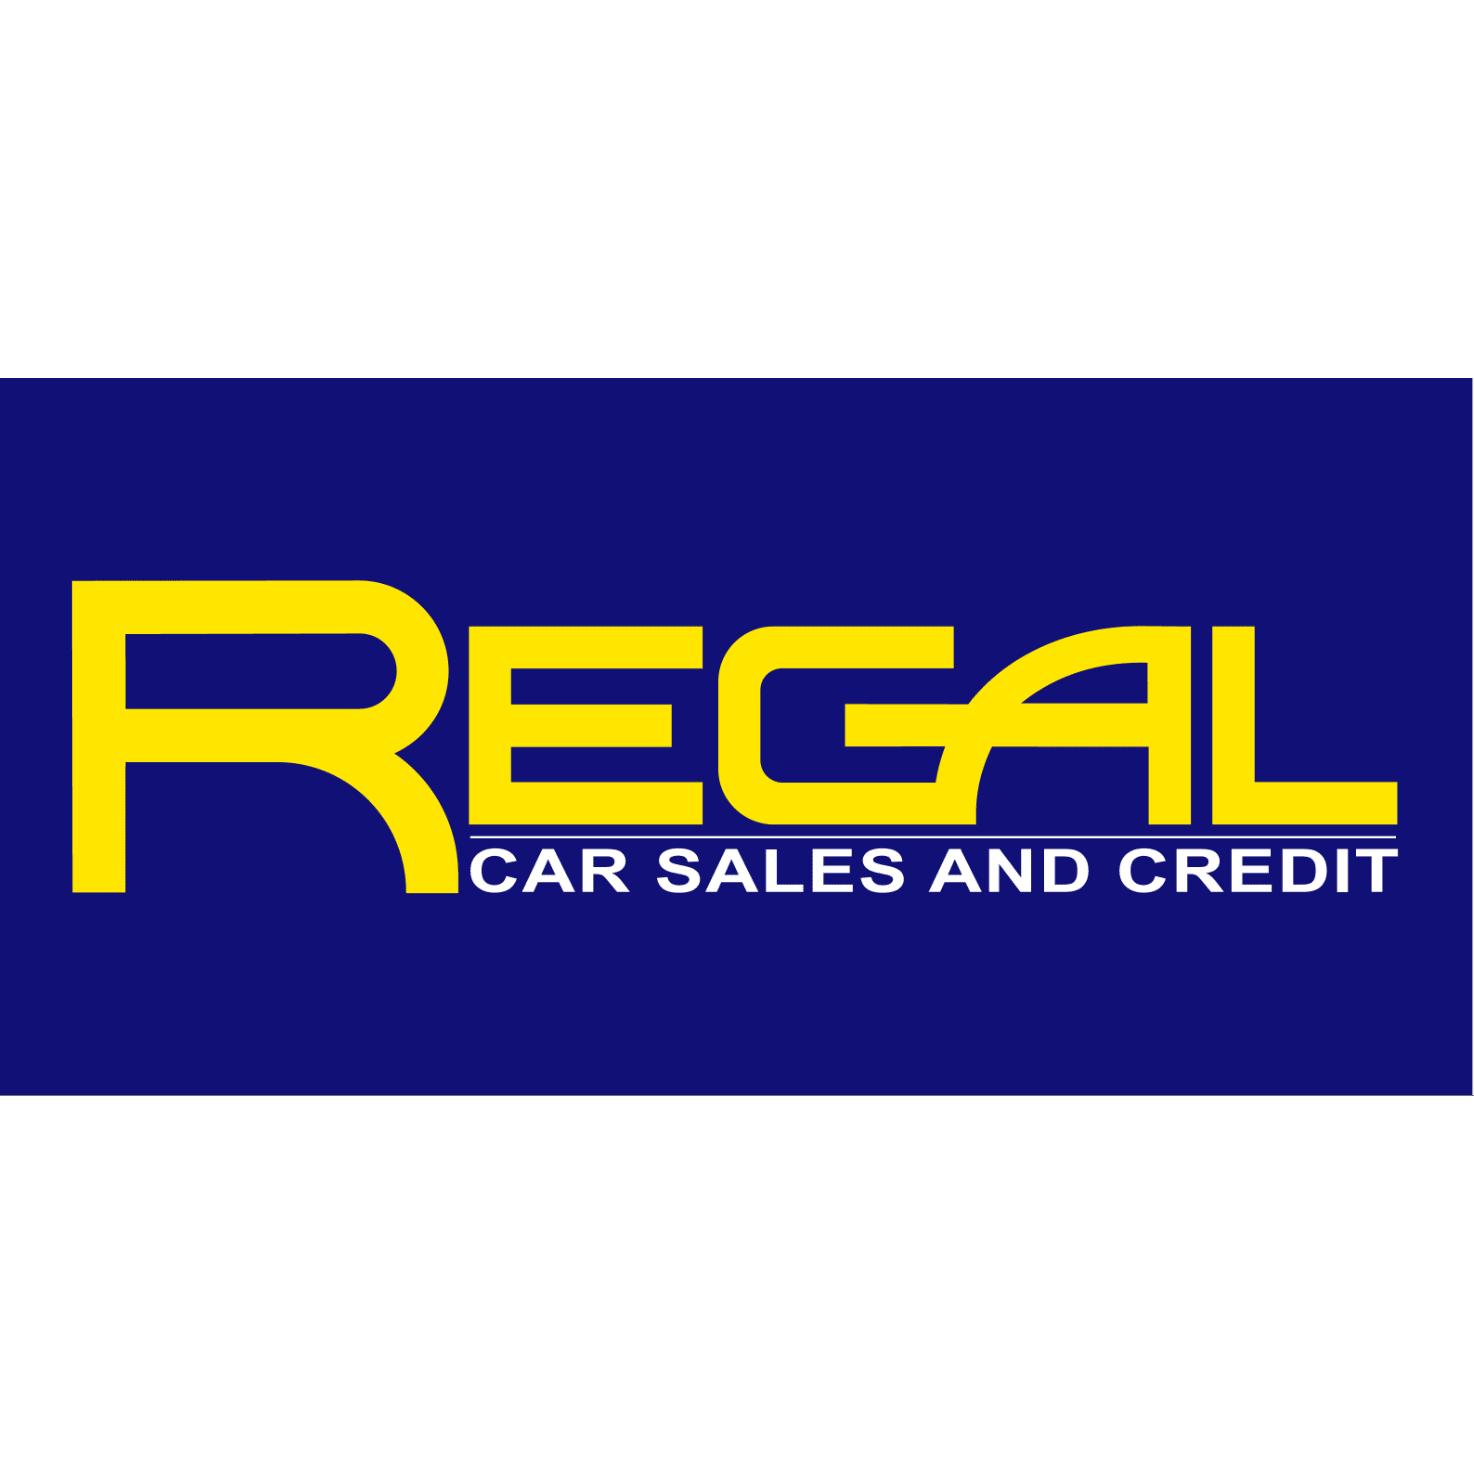 Regal Car Sales and Credit of Tulsa